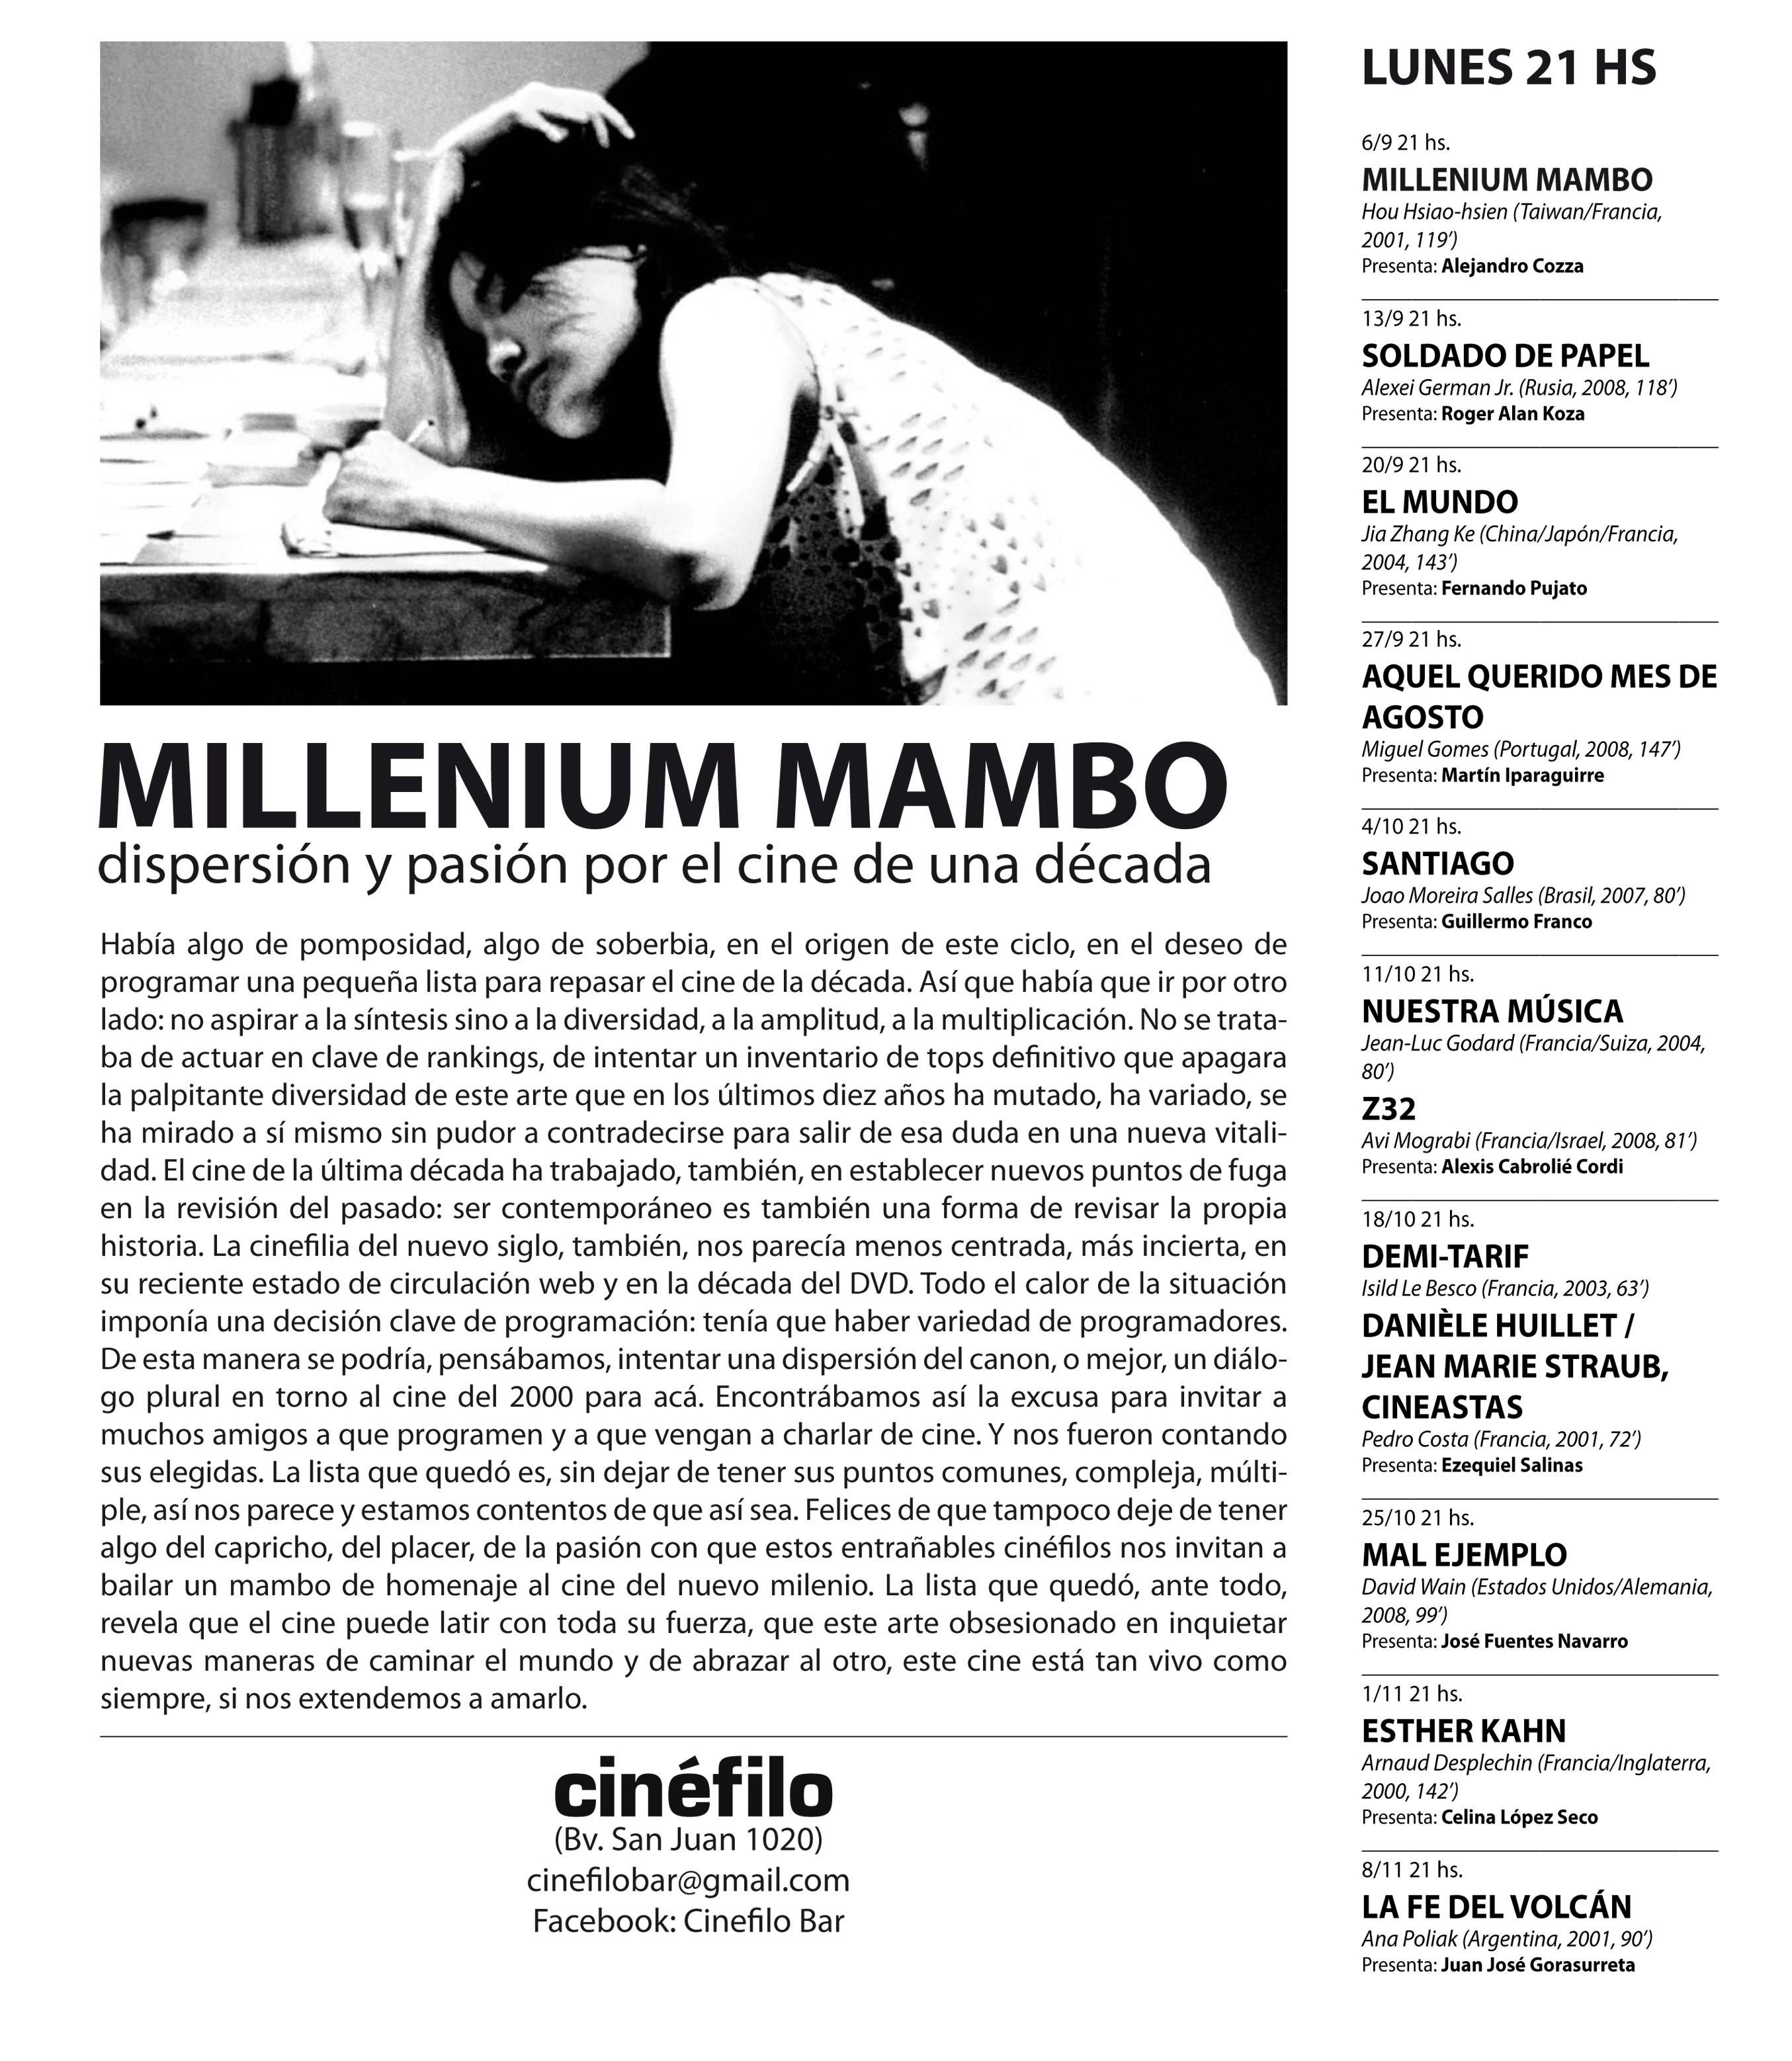 Mambo Y Pistolas Flyer Millenium Mambo